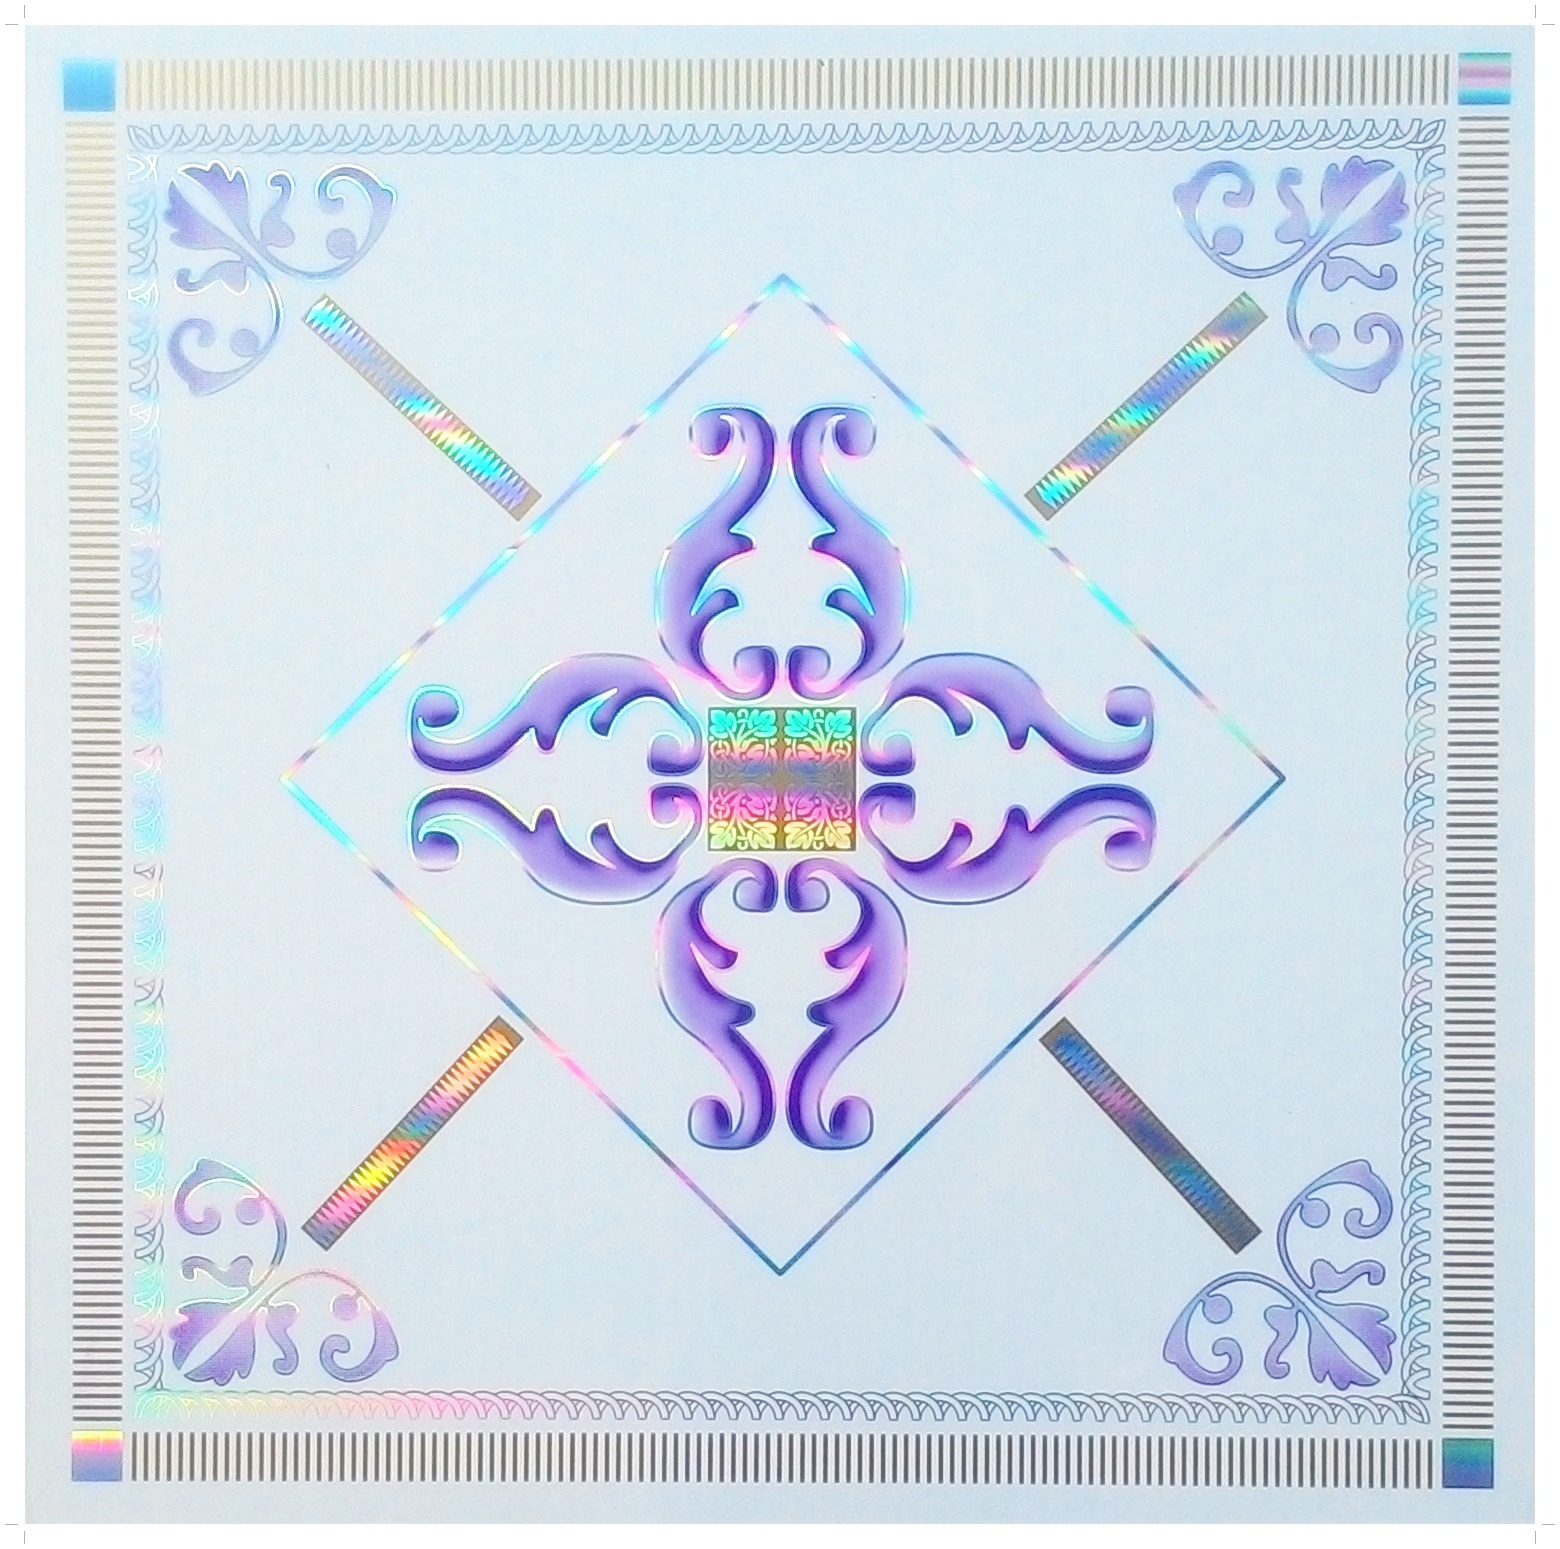 Tấm trần nhựa 600x600- 6519-2